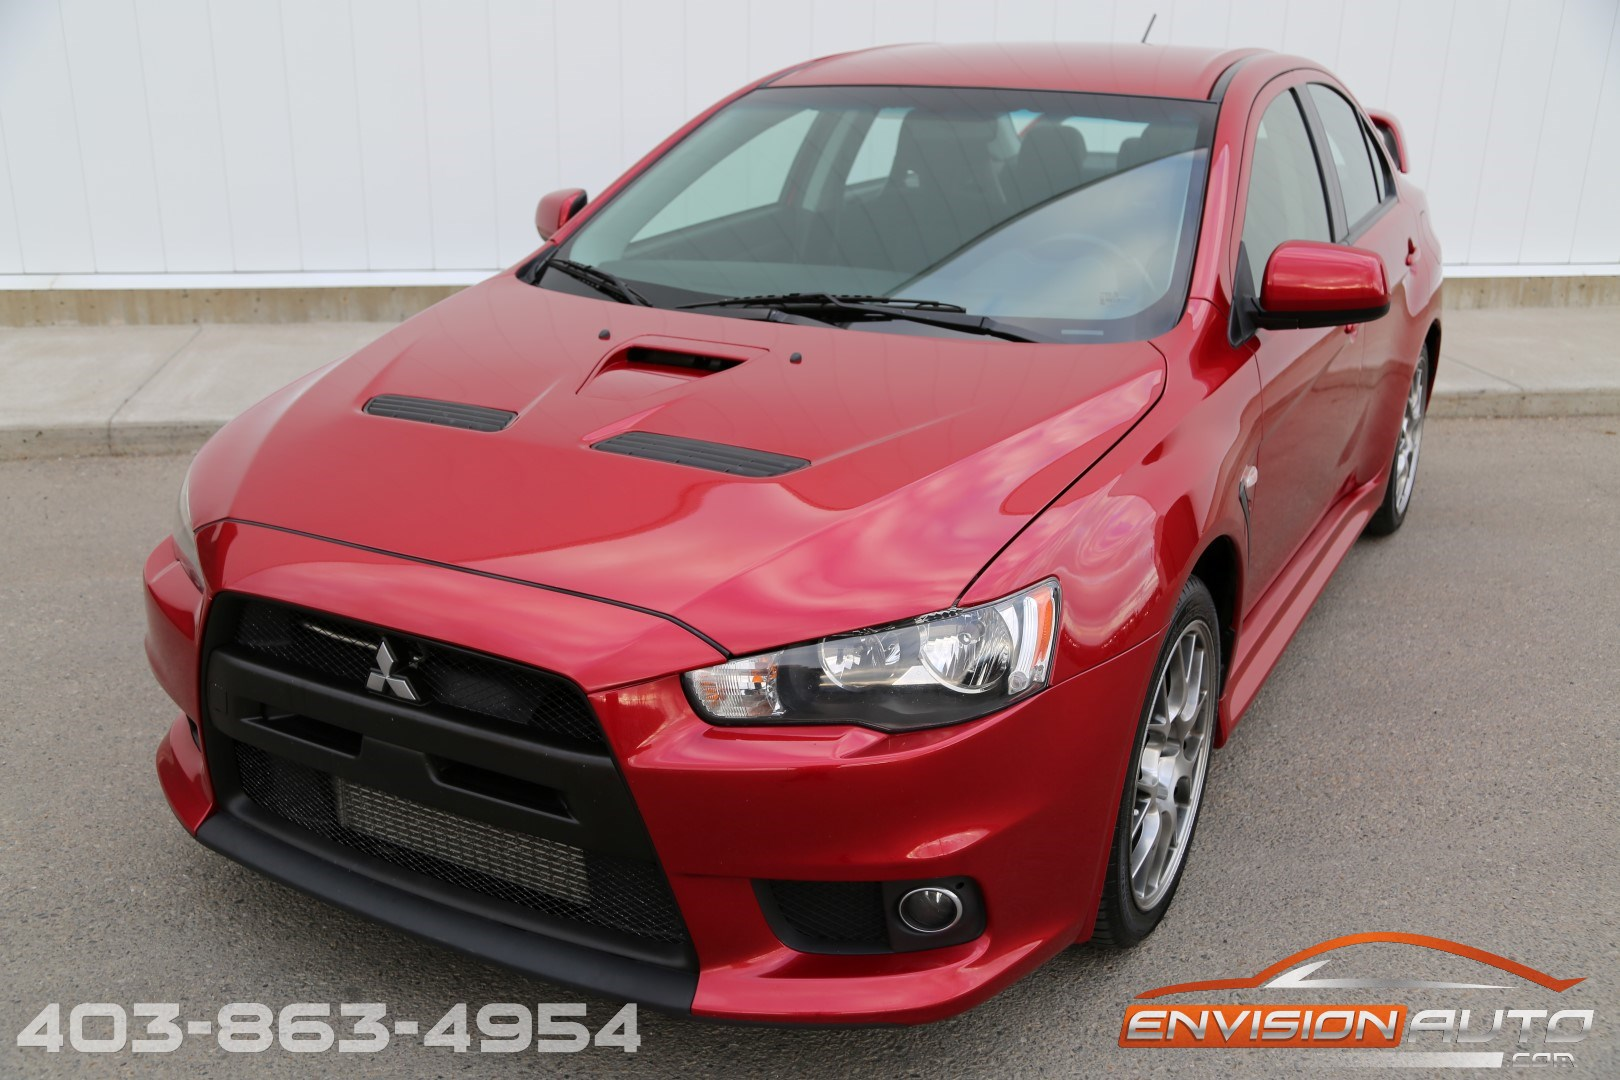 2012 Mitsubishi Lancer Evo X Gsr Recaro Seats Bbs